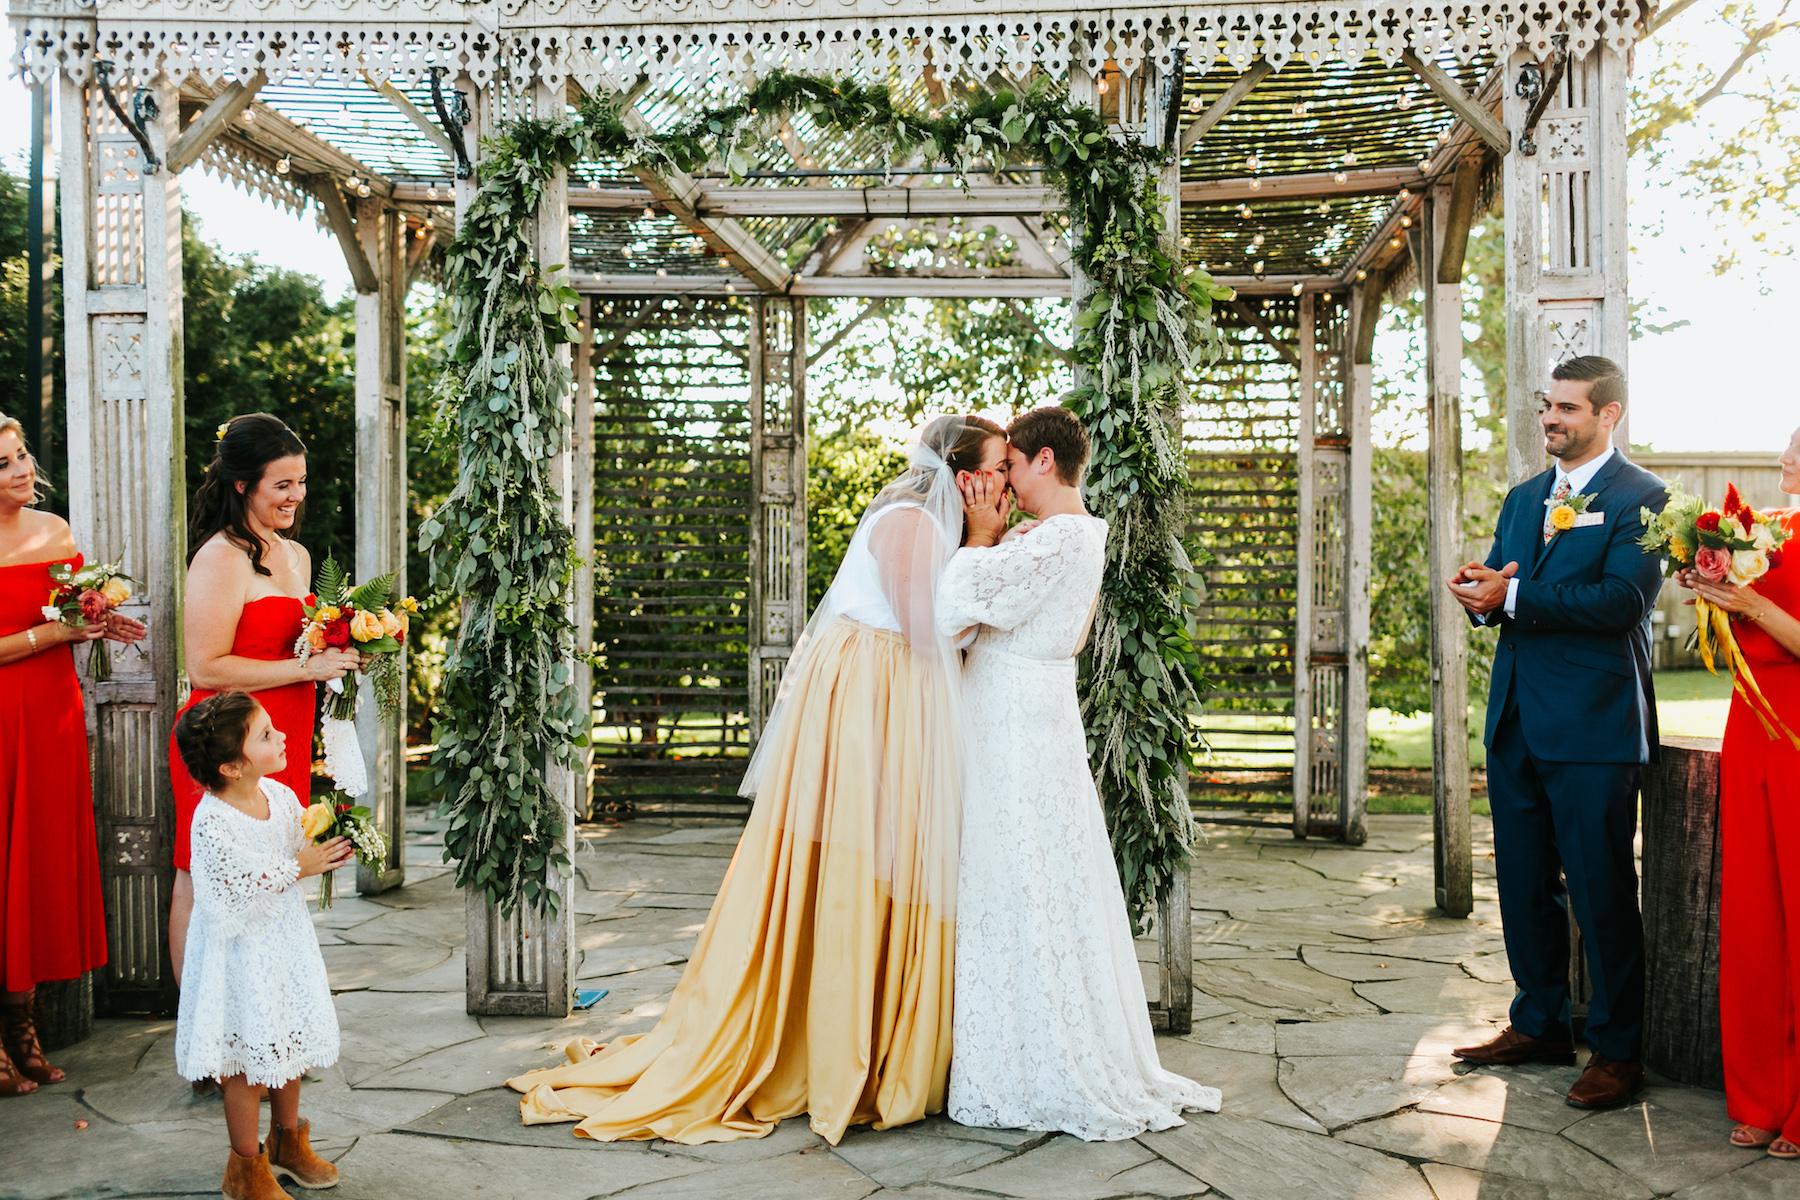 terrain+at+styers+gay+wedding+florist+colly+flowers4.jpg